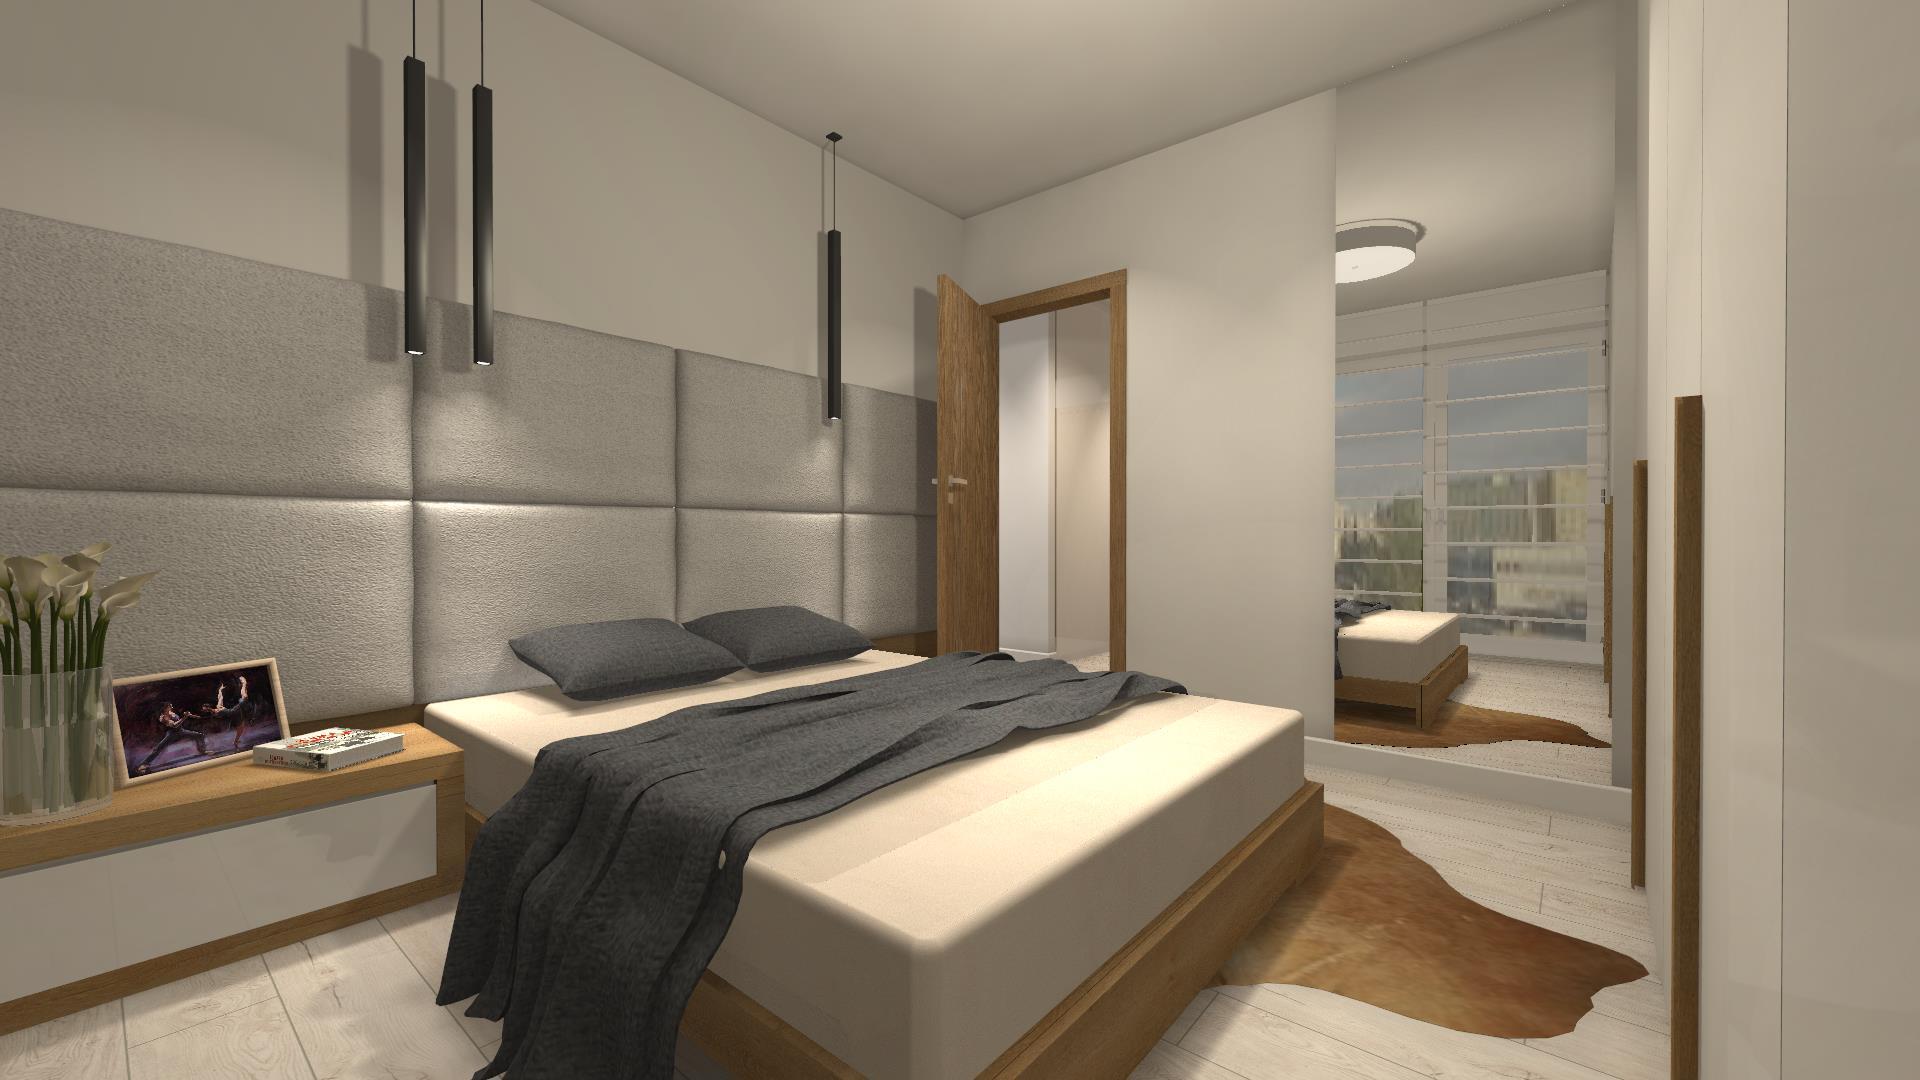 kuchnia i sypialnia_52